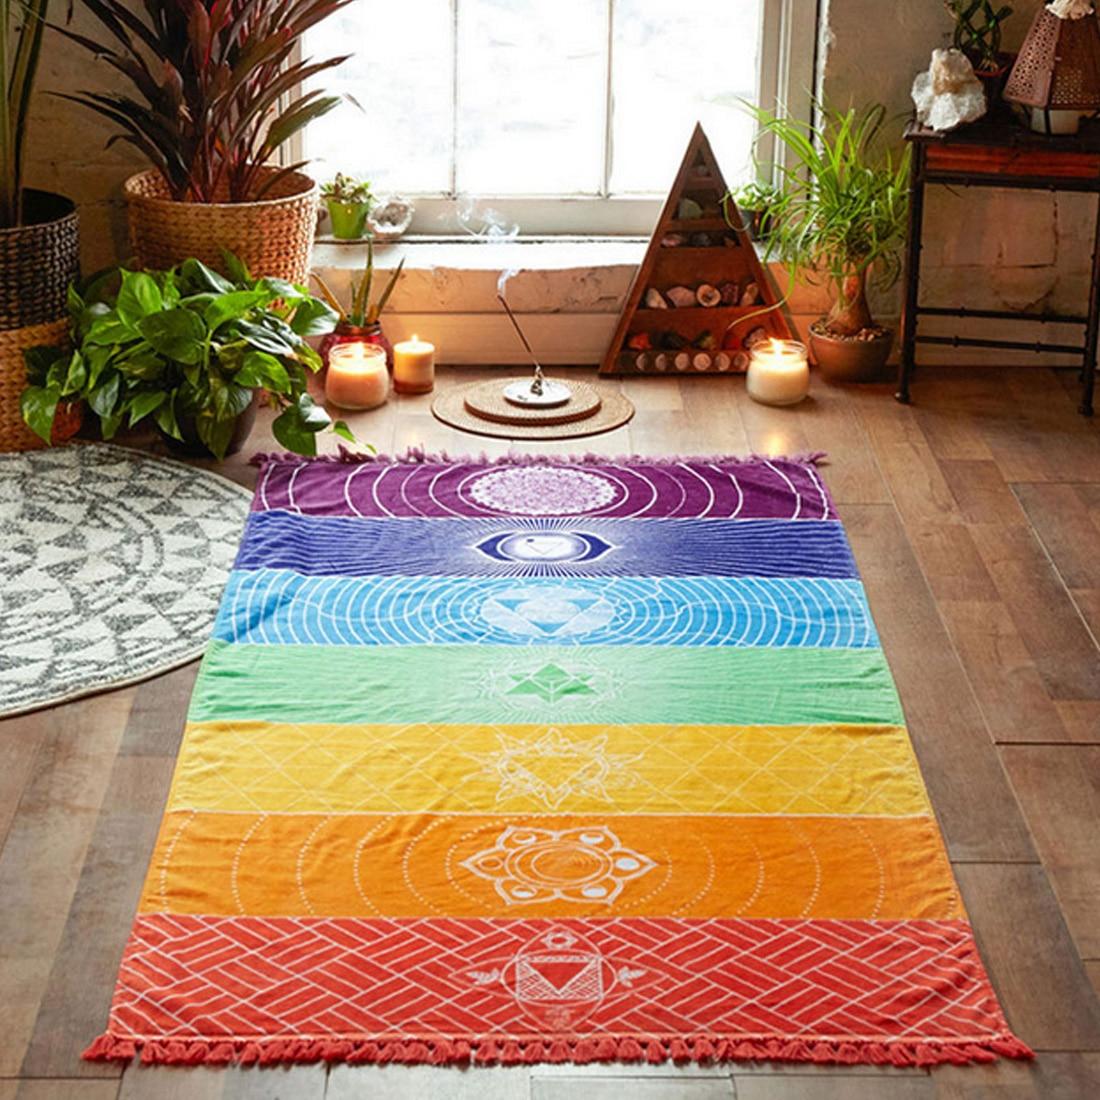 Polyester Bohemia Wall Hanging India Mandala Blanket 7 Chakra Colored Tapestry Rainbow Stripes Travel Beach Yoga Mat